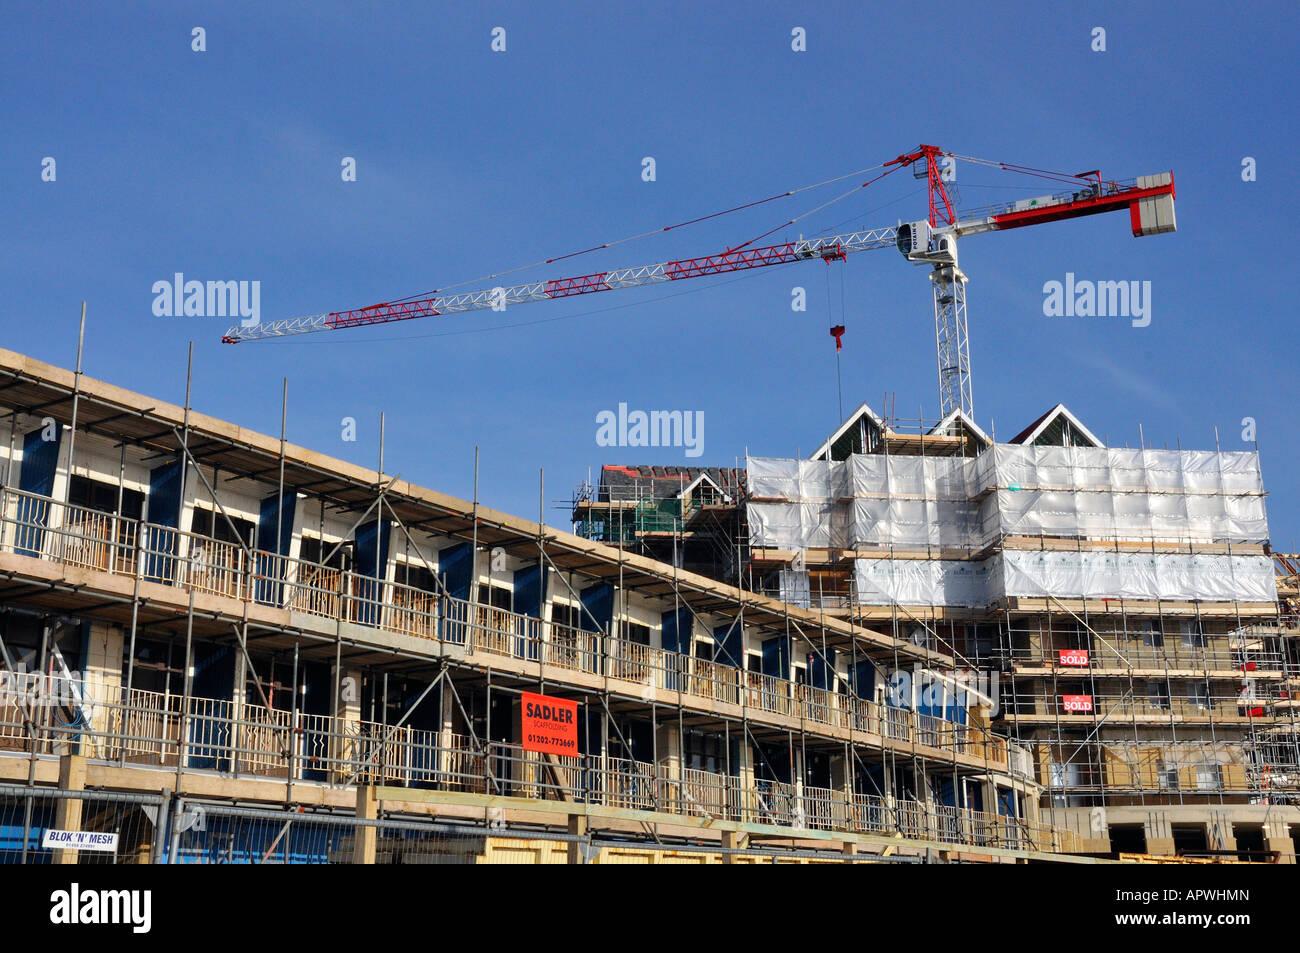 The development of new flats on Honeycombe Chine, Boscombe beach, Dorset, England, UK - Stock Image